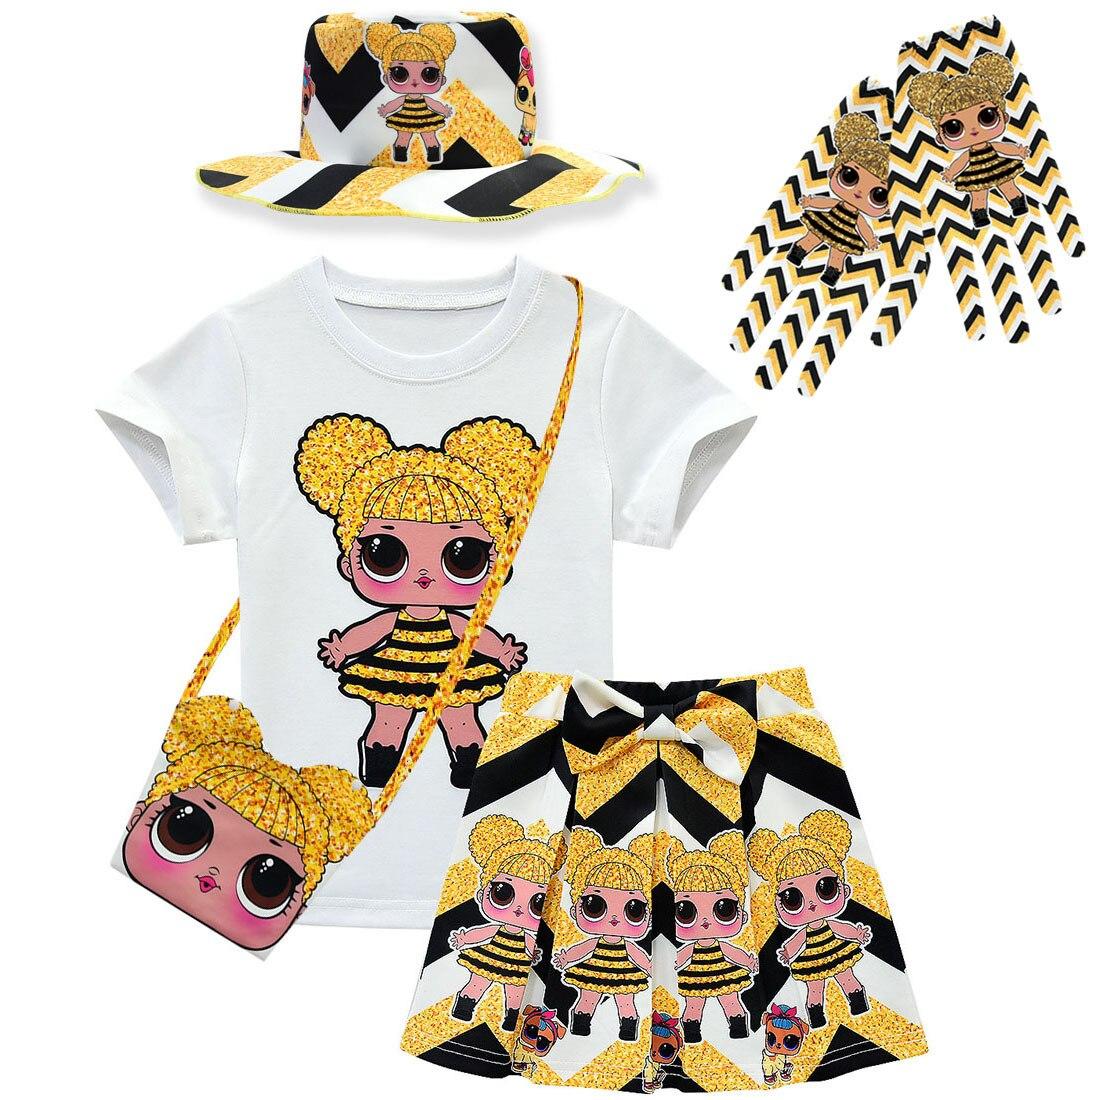 Summer Girls Clothing Lol Set Baby Kids Toddler Girls Set Clothes Birthday Party Tutu Dress Tshirt Skirt Bag Hat Gloves Suit